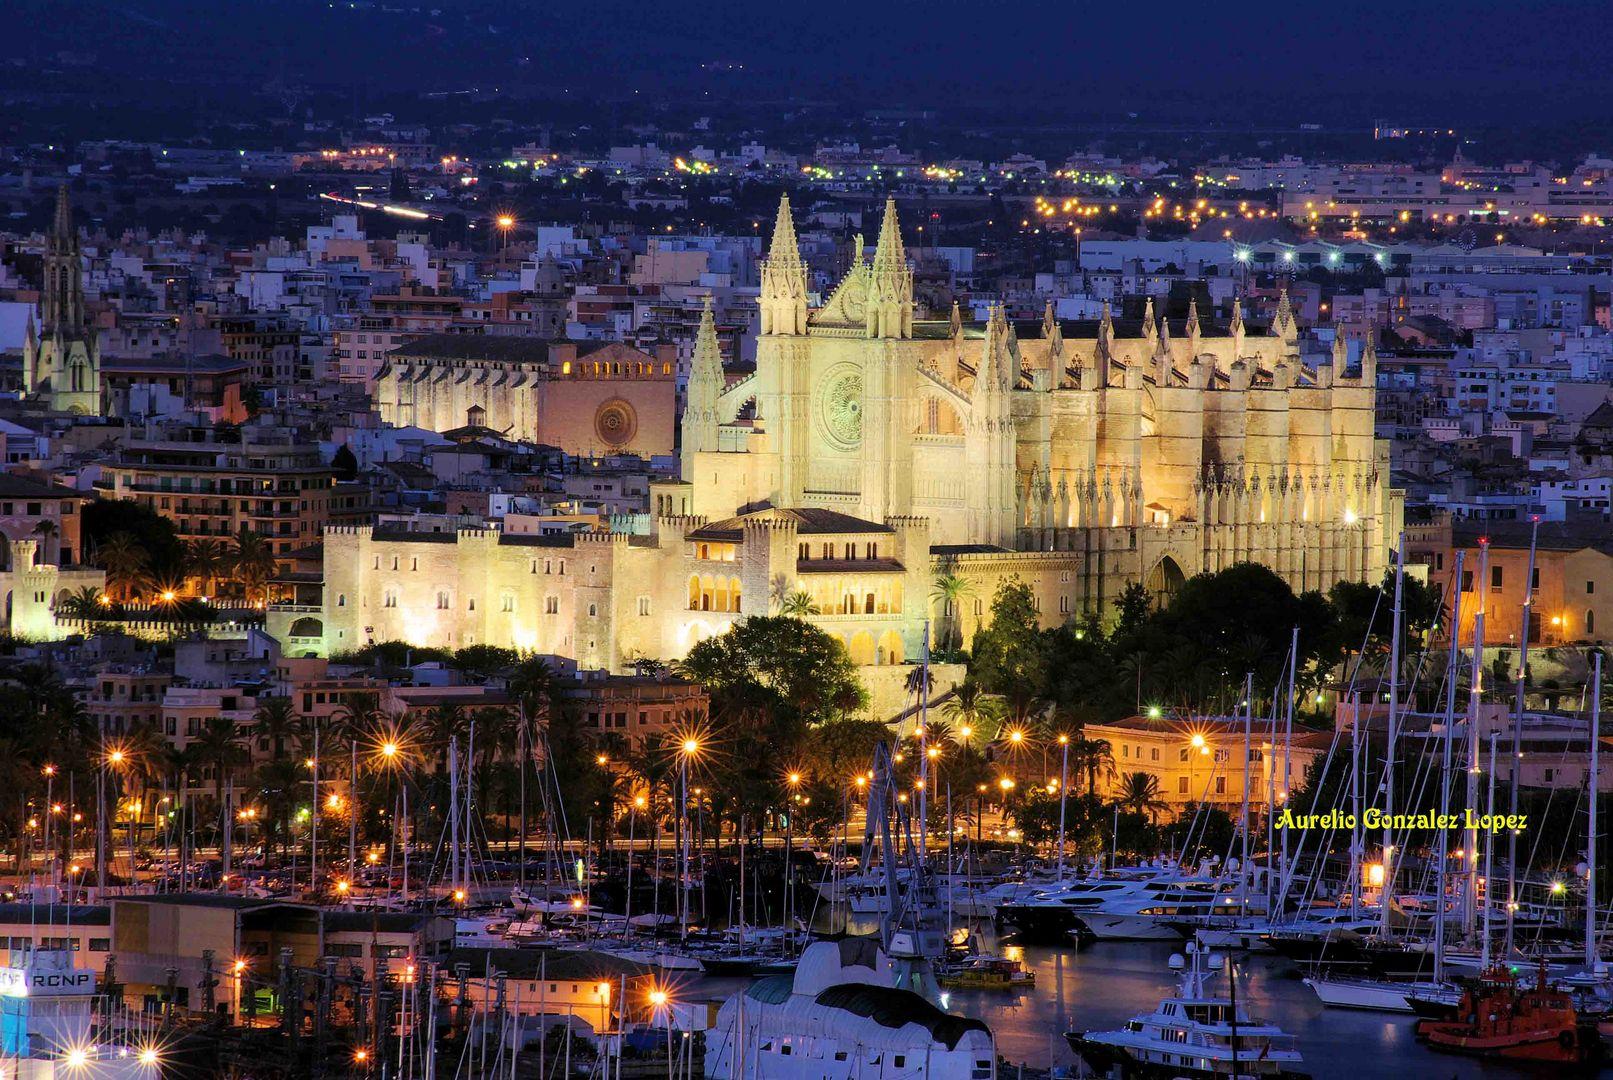 Catedral y palacio de la almudaina de palma de mallorca - Fotografia palma de mallorca ...